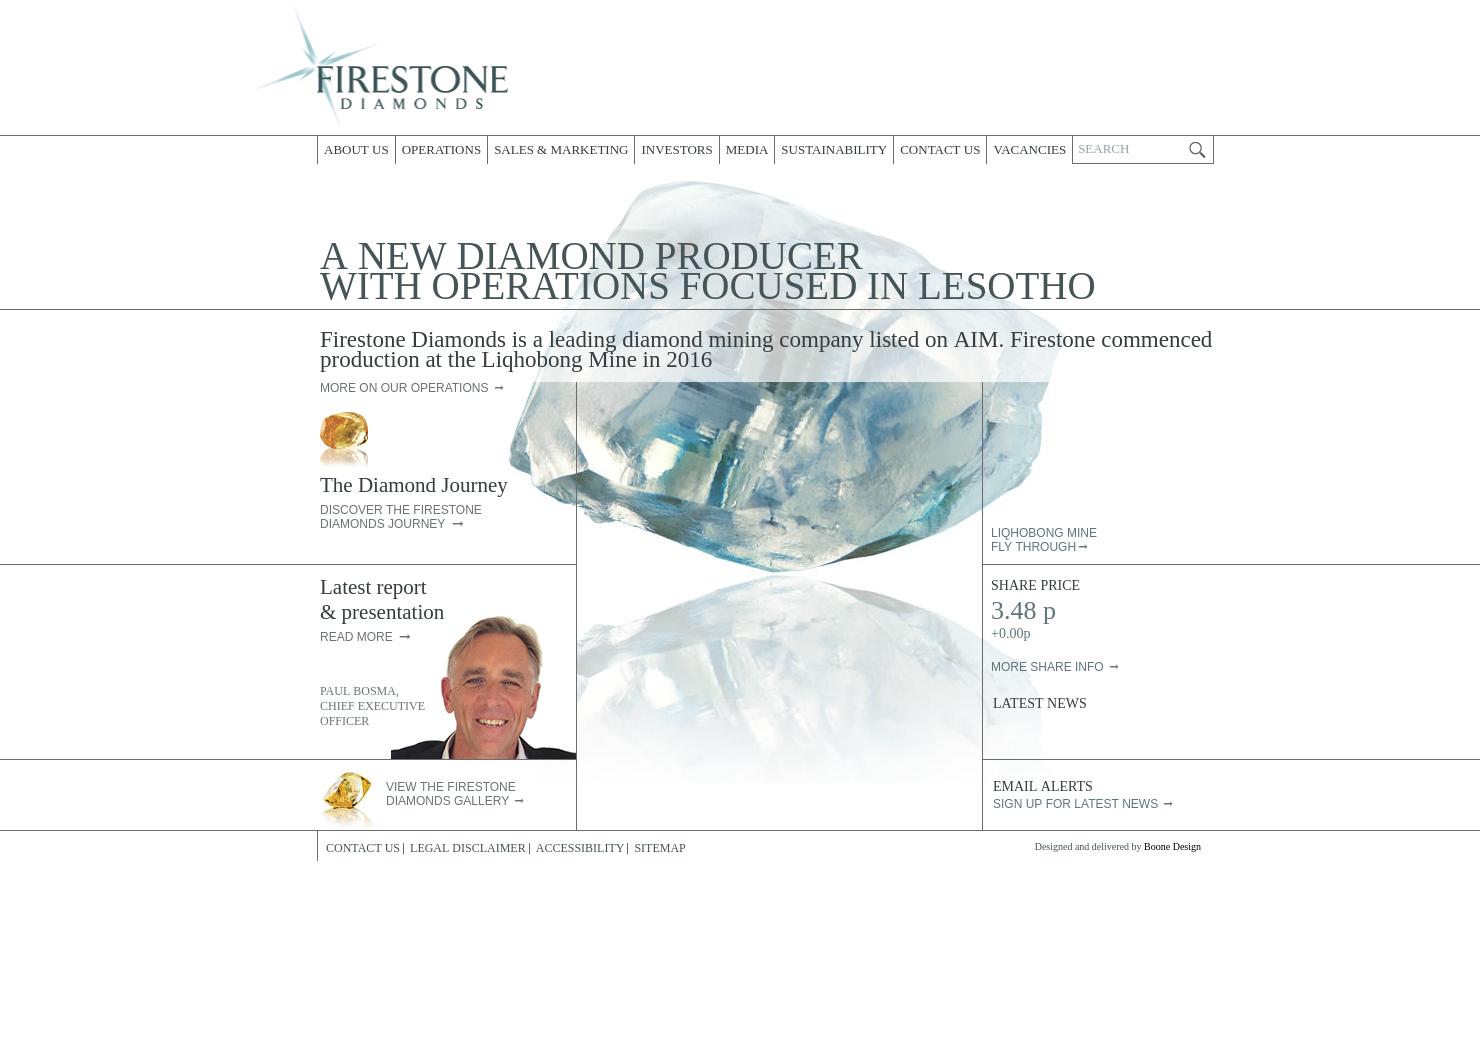 Firestone Diamonds Home Page